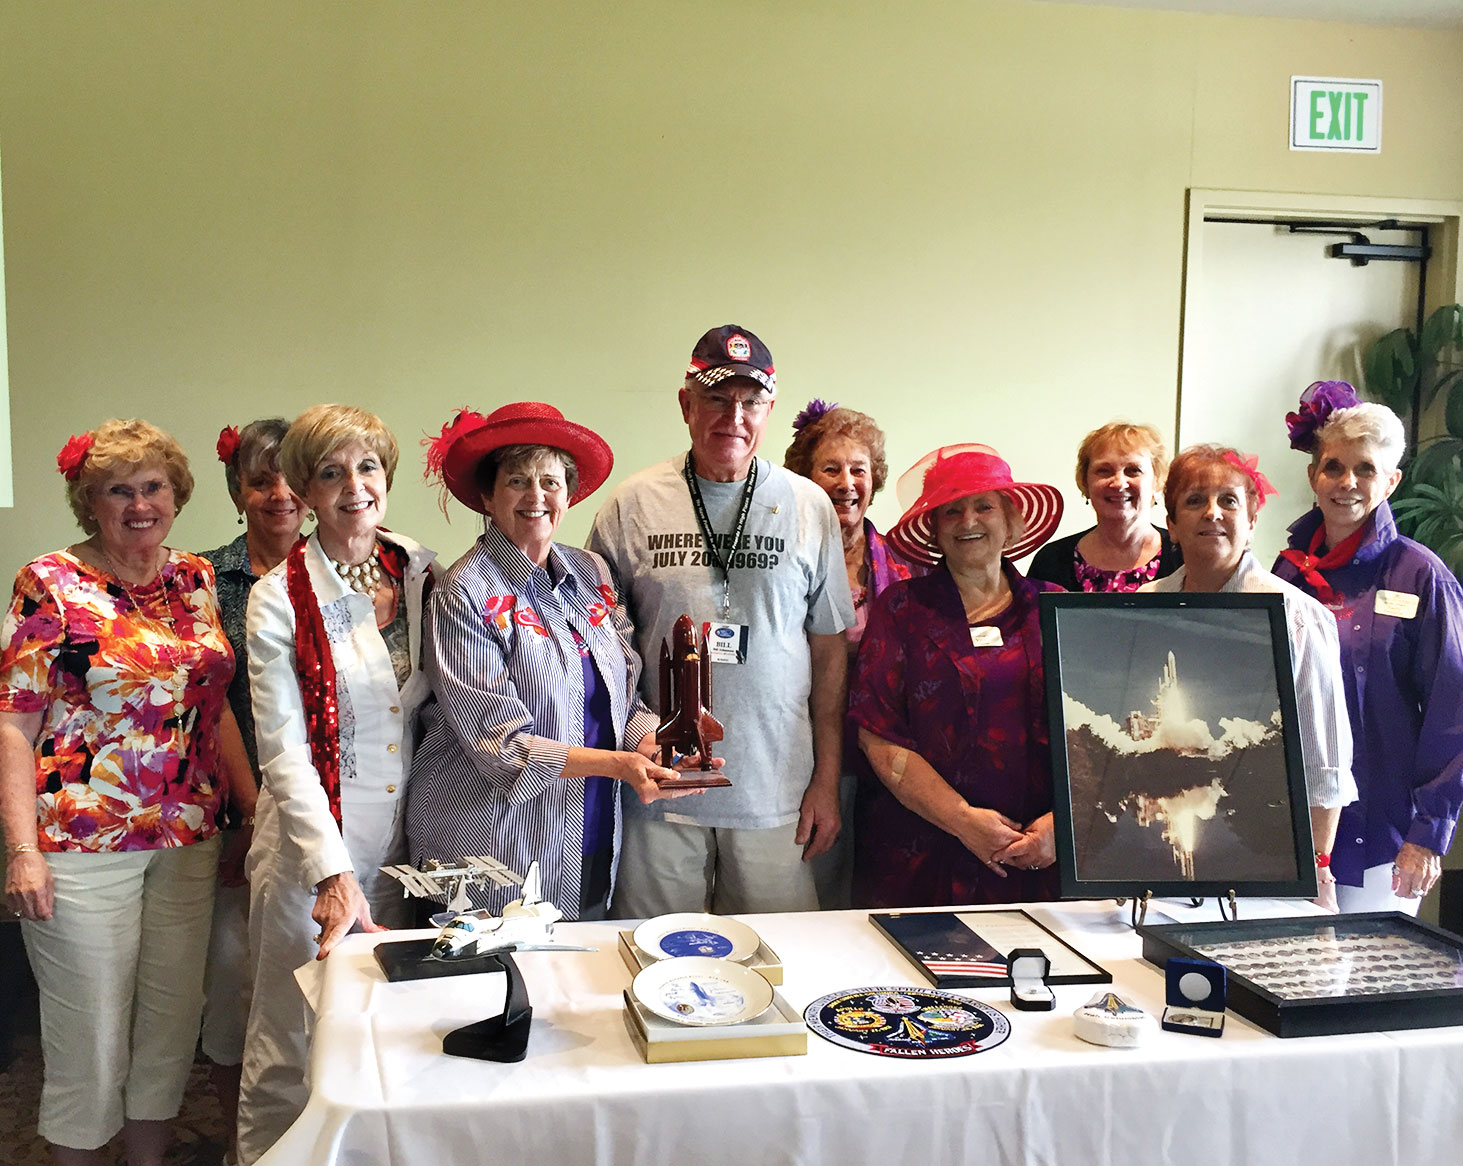 Left to right: Jean Euker, Joan Petre, Shirley Minderman, Lynne Hendren, Bill Johansson, Bev Clegg, Vicky Taylor, April Bayne, Trudy Searles and Sally Hampton